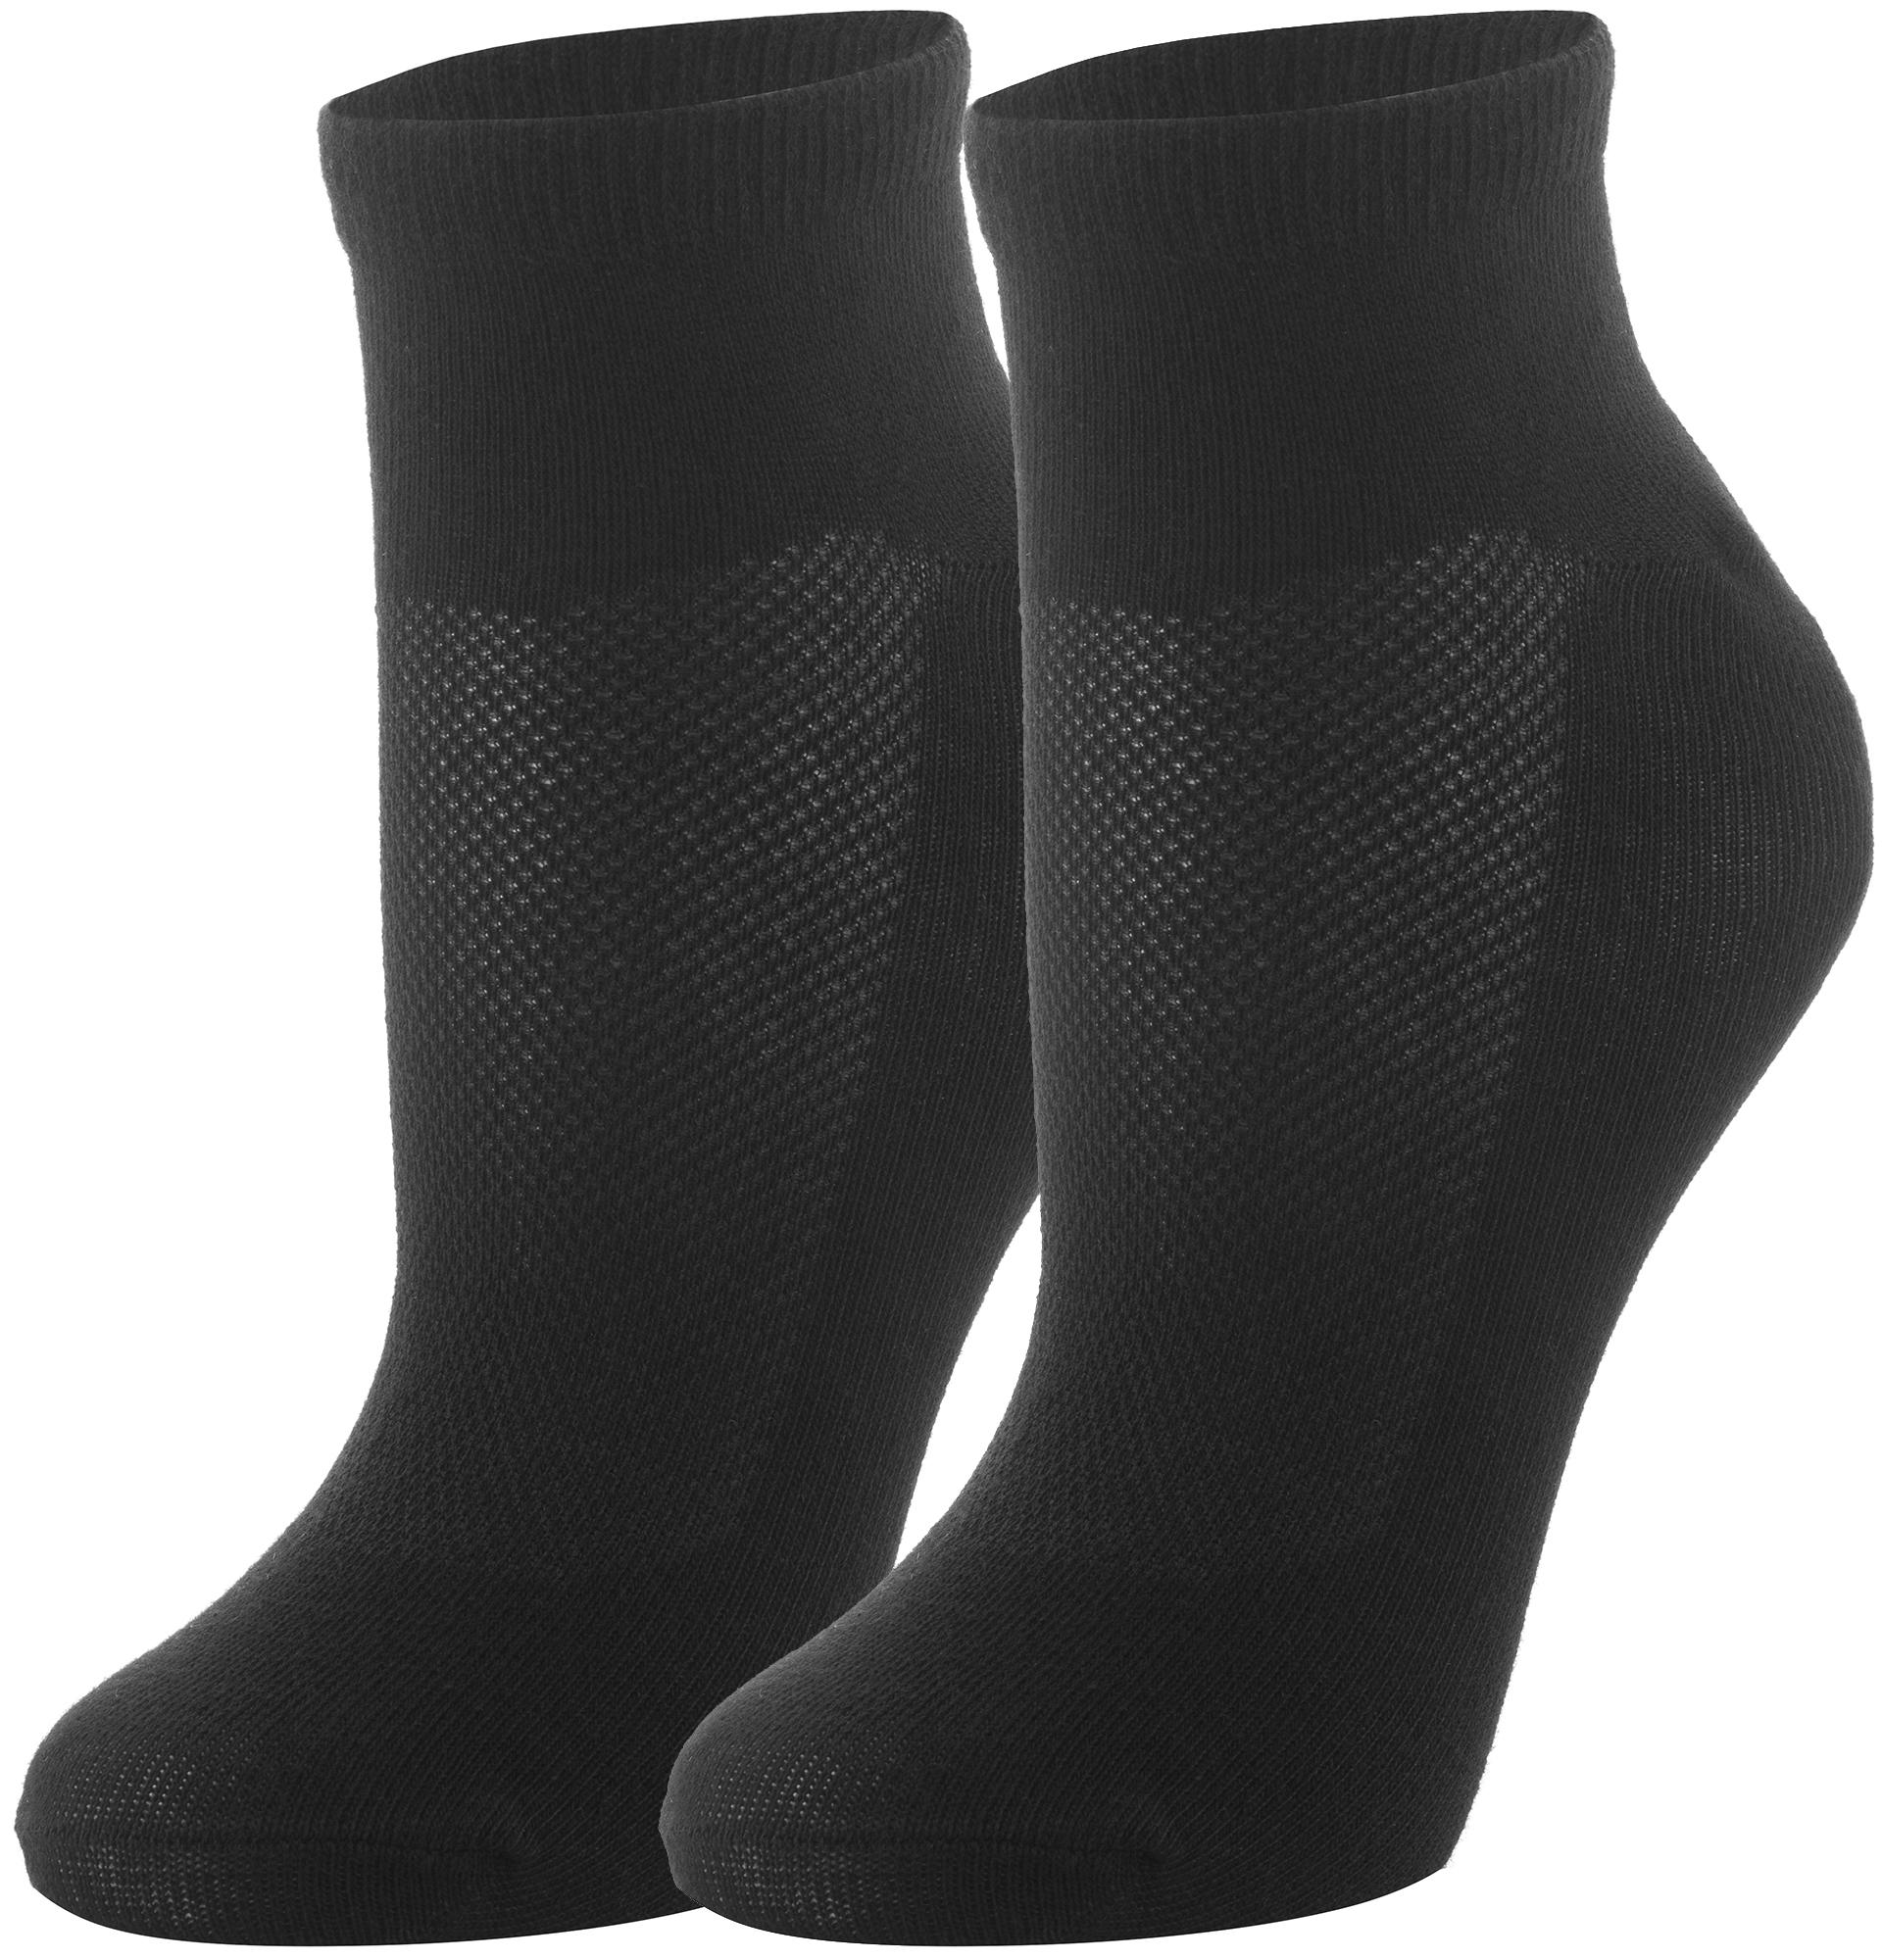 Demix Носки Demix, 2 пары носки windy bay носки 4 пары